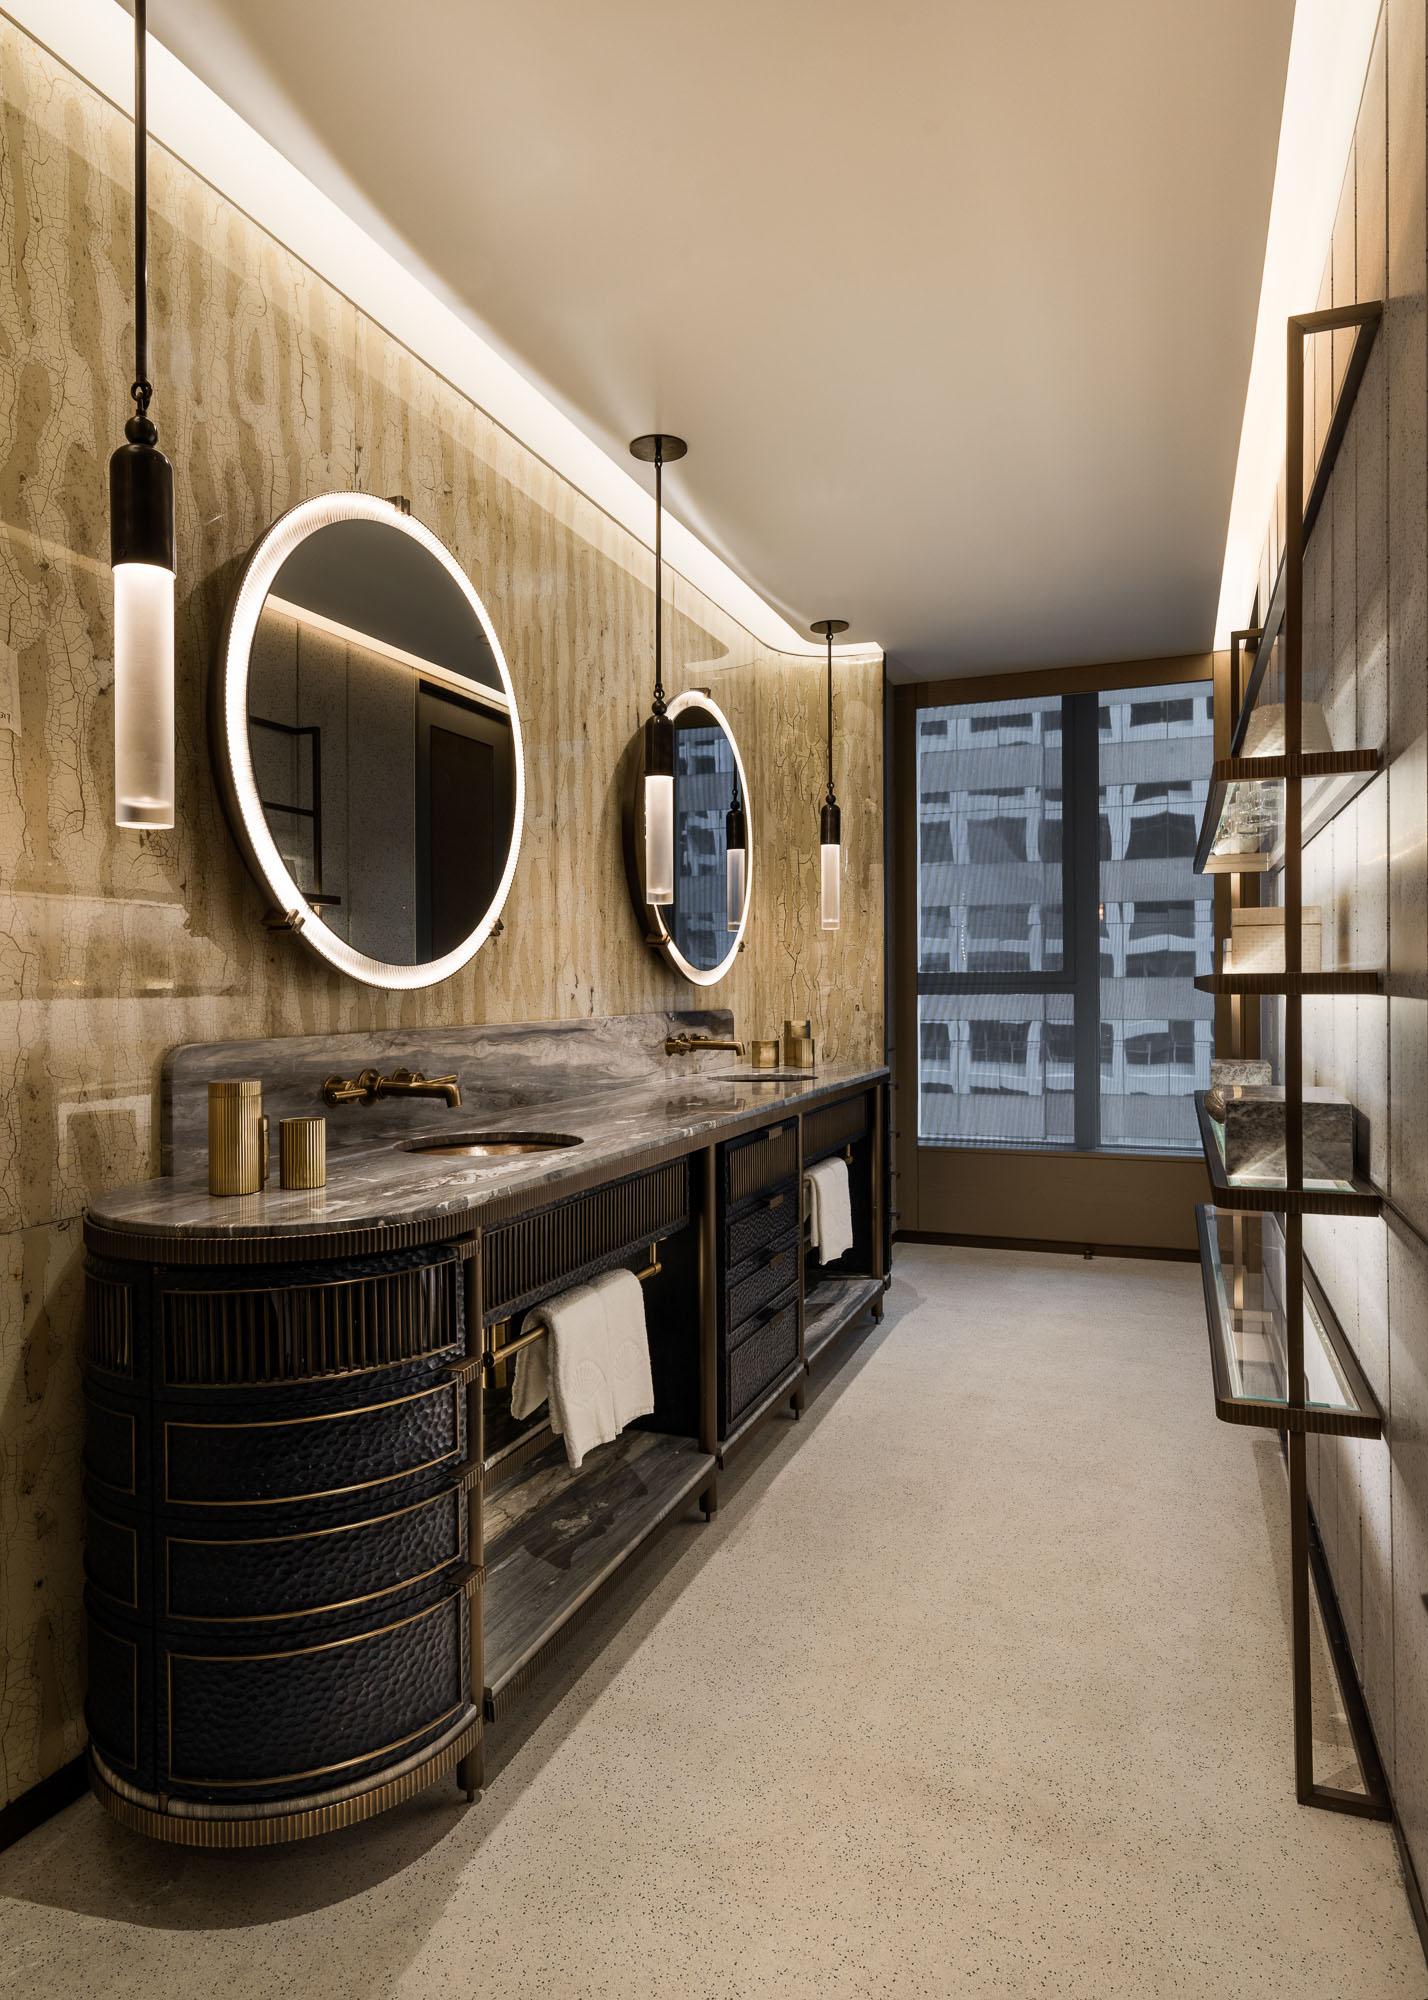 joyce-wang-landmark-mandarin-oriental-bathroom-vanity-area-indesignlive-hk-1